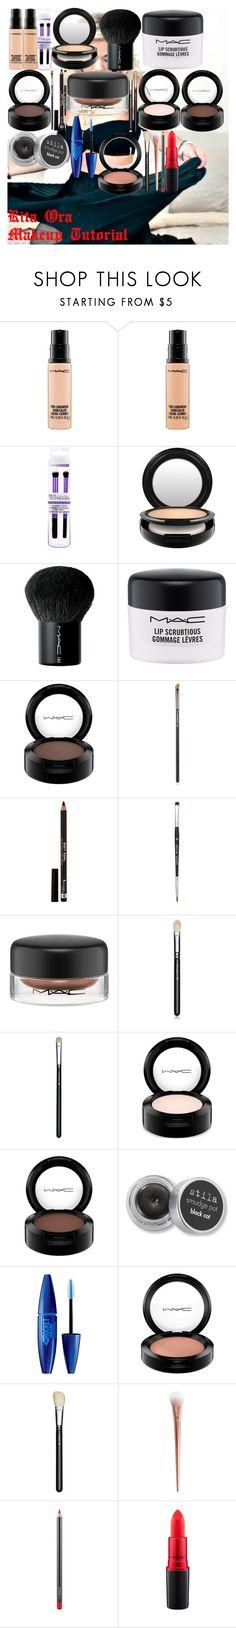 """Rita Ora Makeup Tutorial"" by oroartye-1 on Polyvore featuring beauty, MAC Cosmetics, Rimmel, Stila and Maybelline"